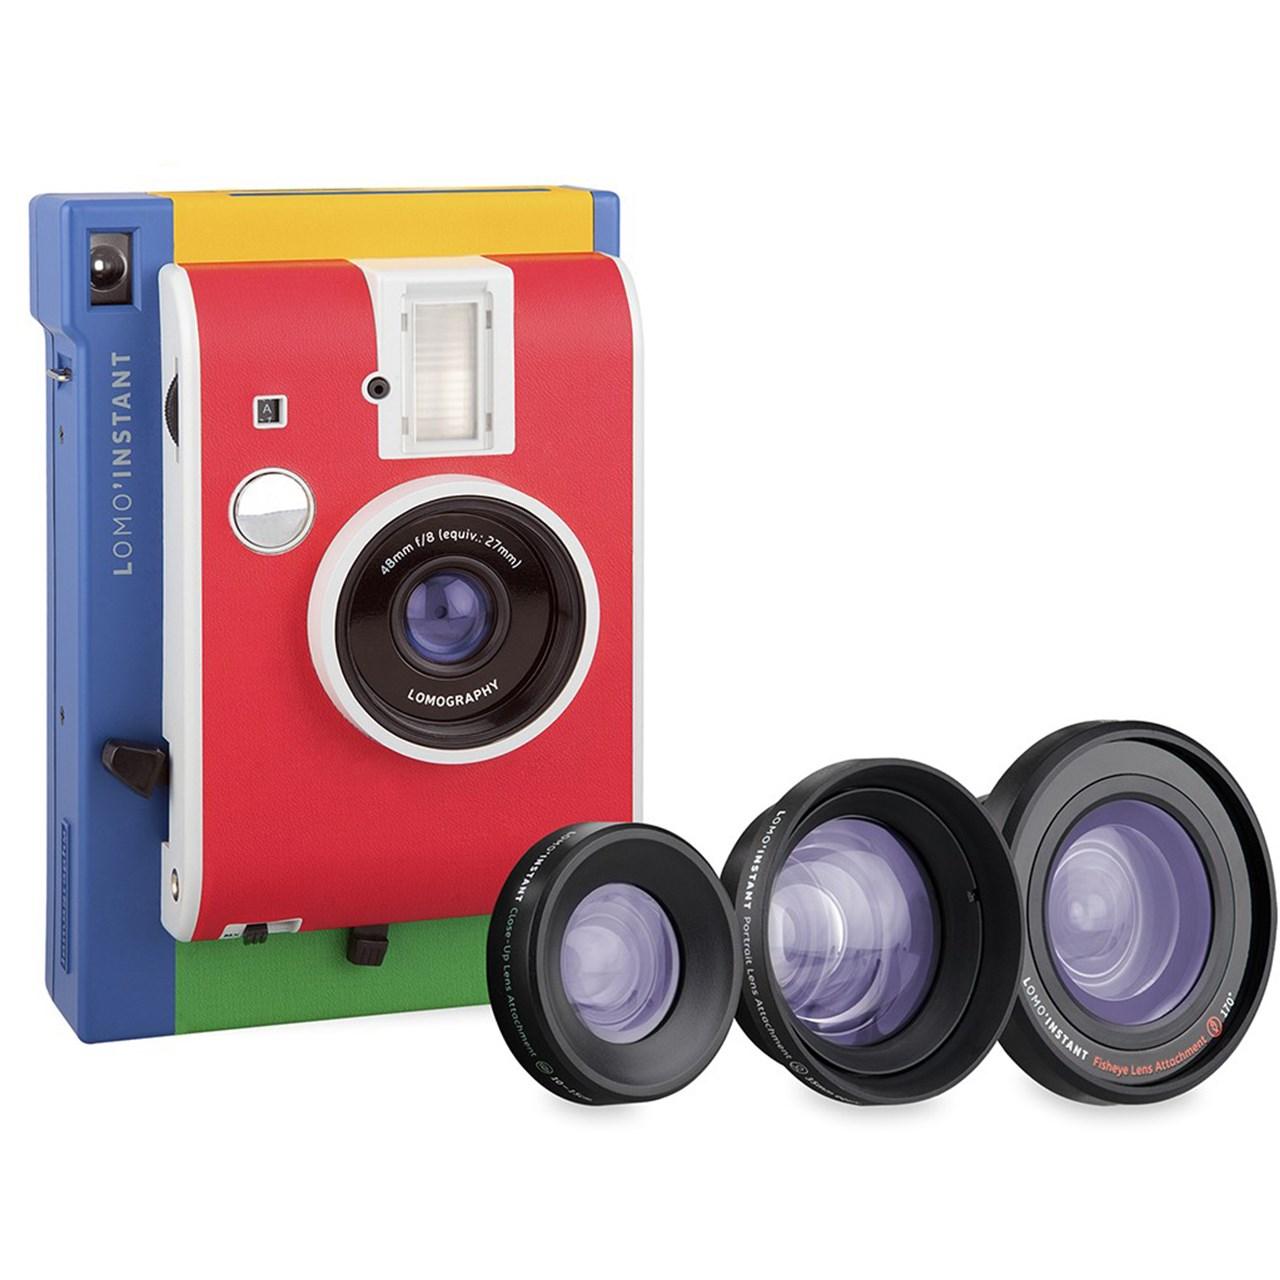 دوربین چاپ سریع لوموگرافی مدل Murano به همراه سه لنز